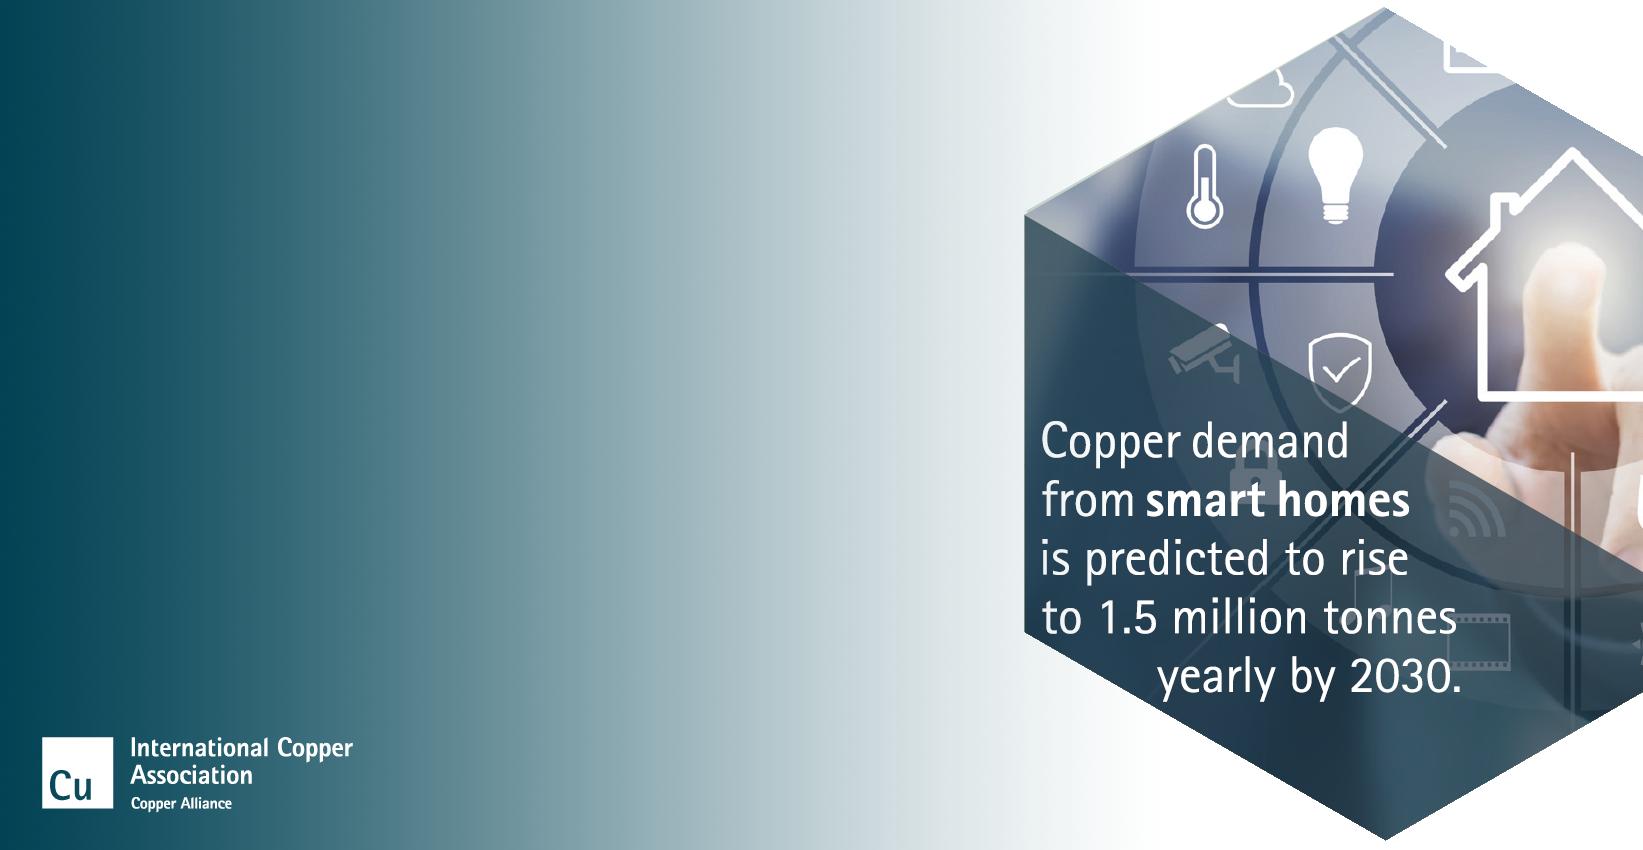 ICA Members - Copper Alliance